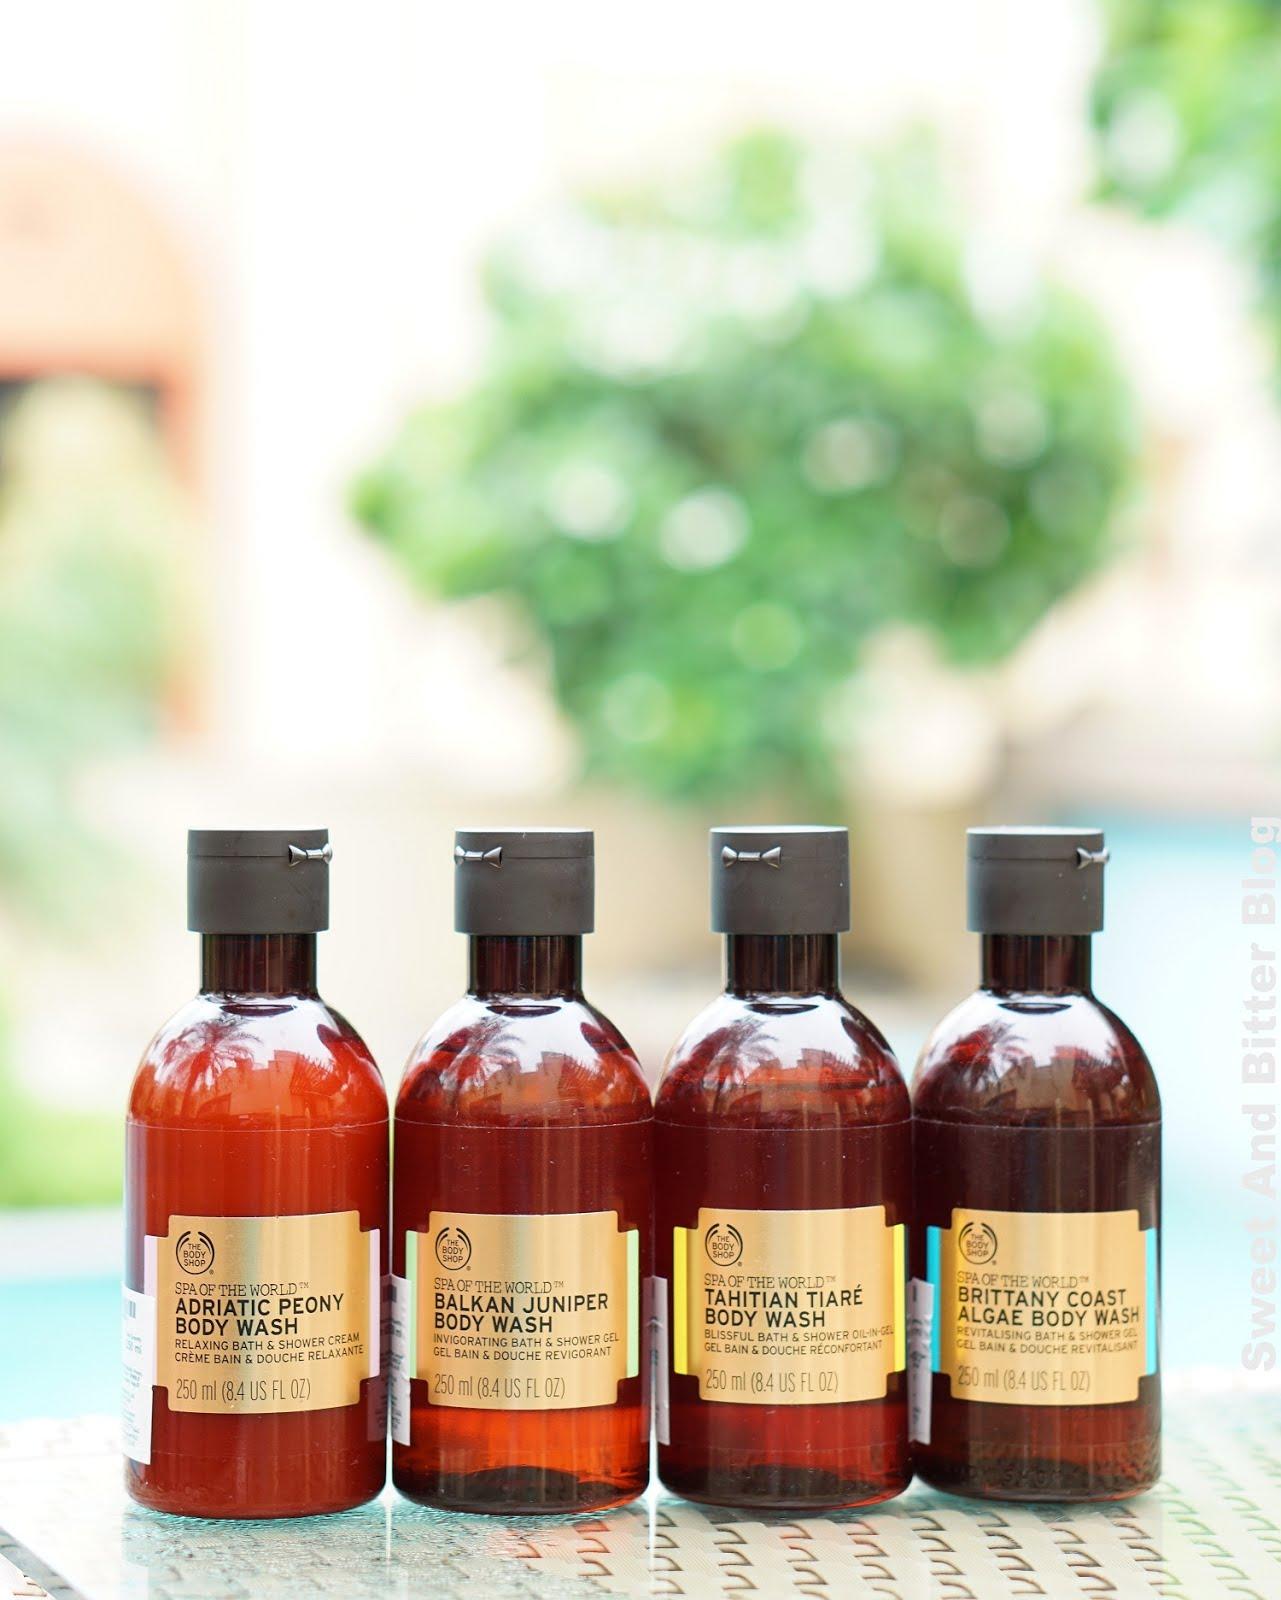 The Body Shop Spa of the World Brittany Coast Algae Bath and Shower Gel, Tahitian Tiaré Bath and Shower Oil-in-Gel, Balkan Juniper Body Wash, Adriatic Peony Bath and Shower Cream Review India